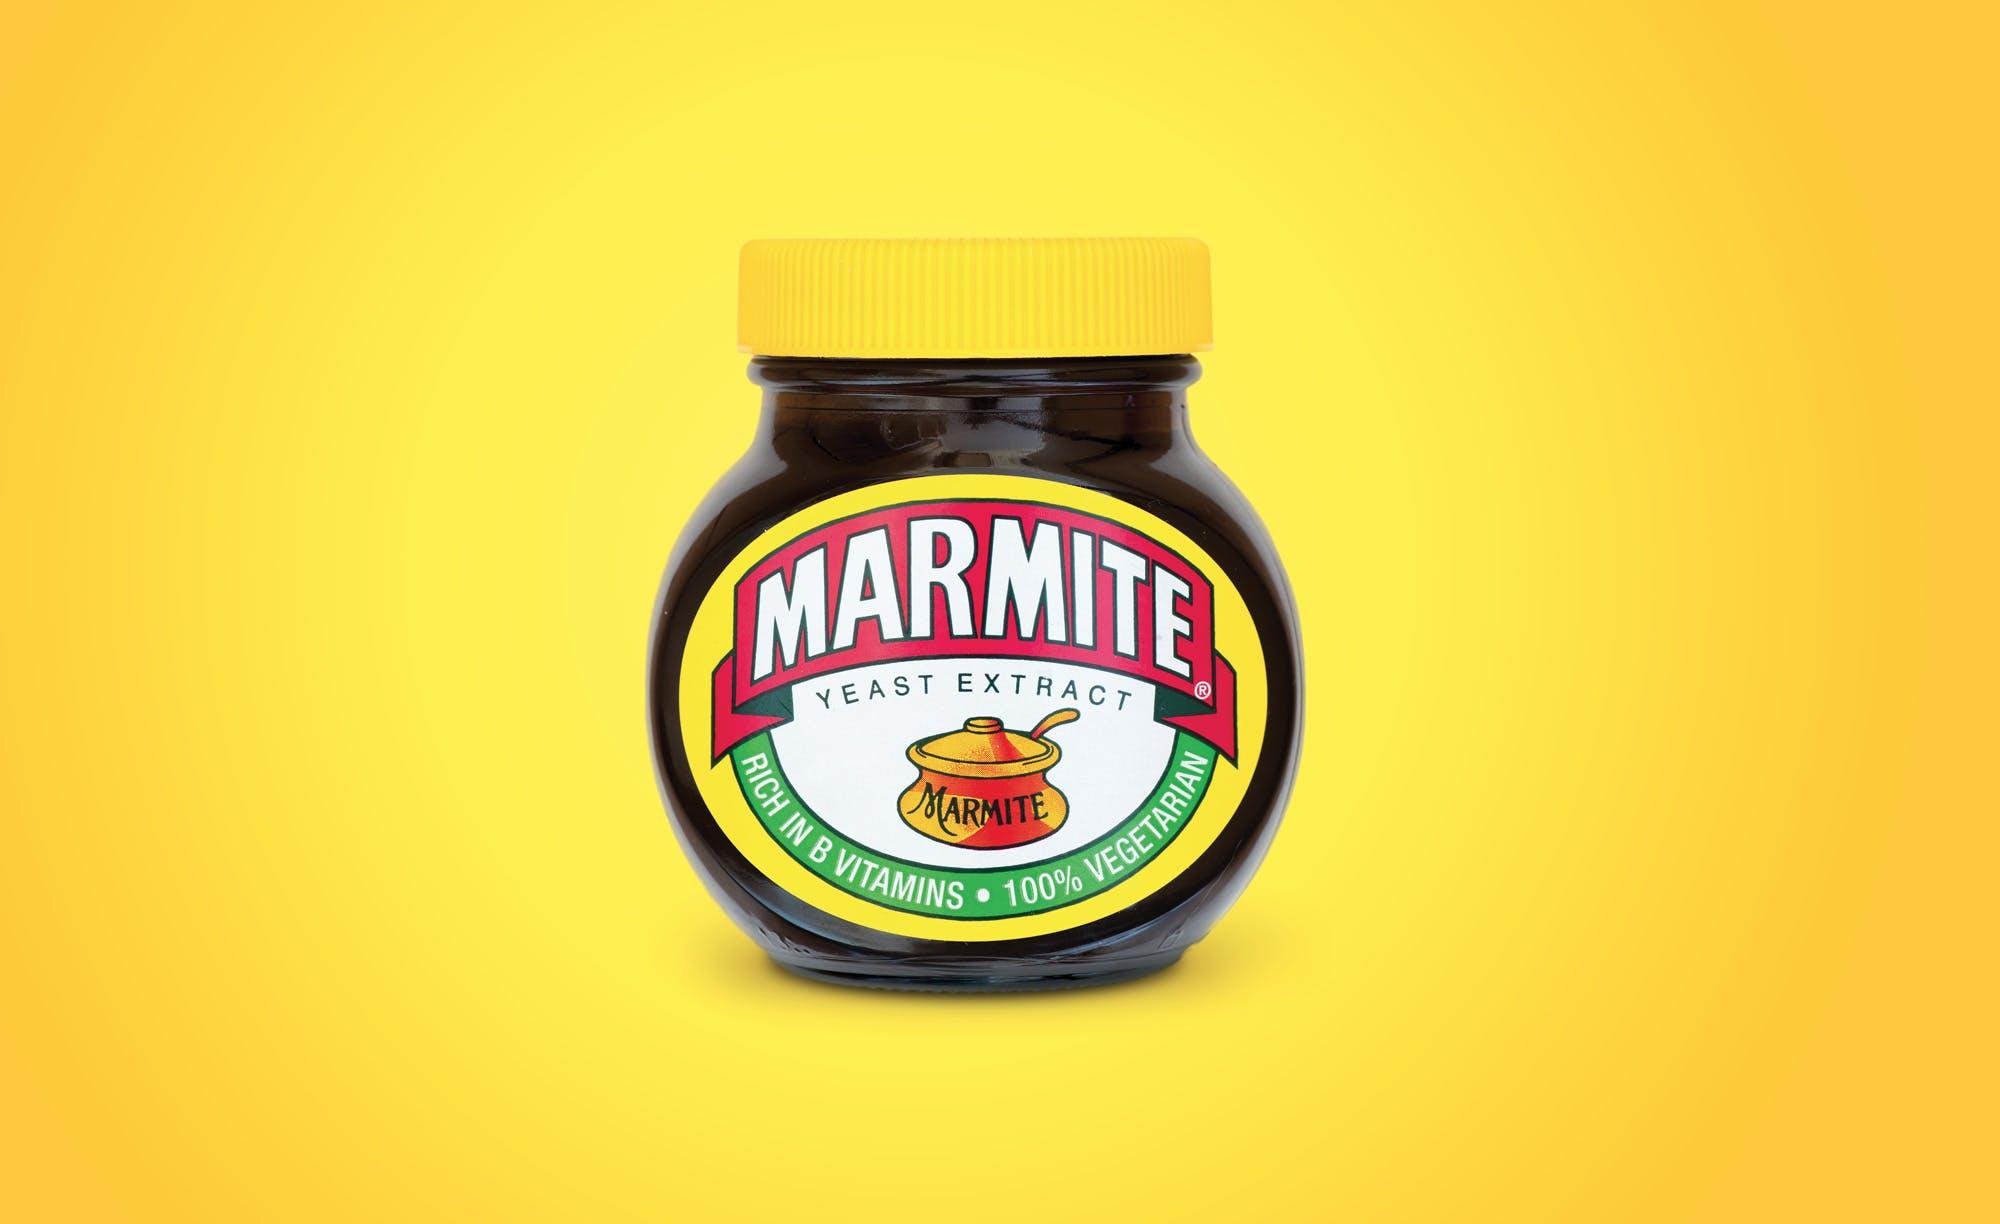 Marmite - the trusted taste of breakfast since 1902.